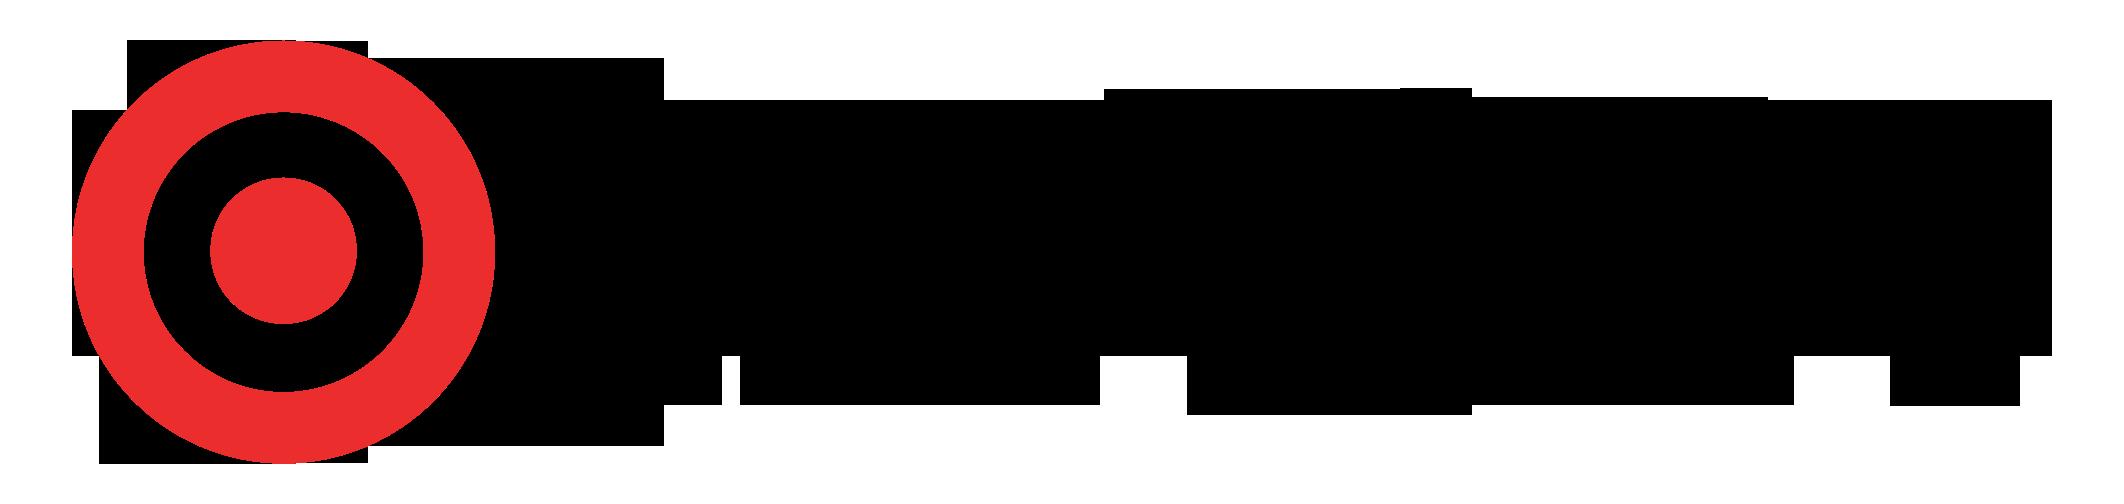 Target Logo PNG Image - PurePNG   Free transparent CC0 PNG ...